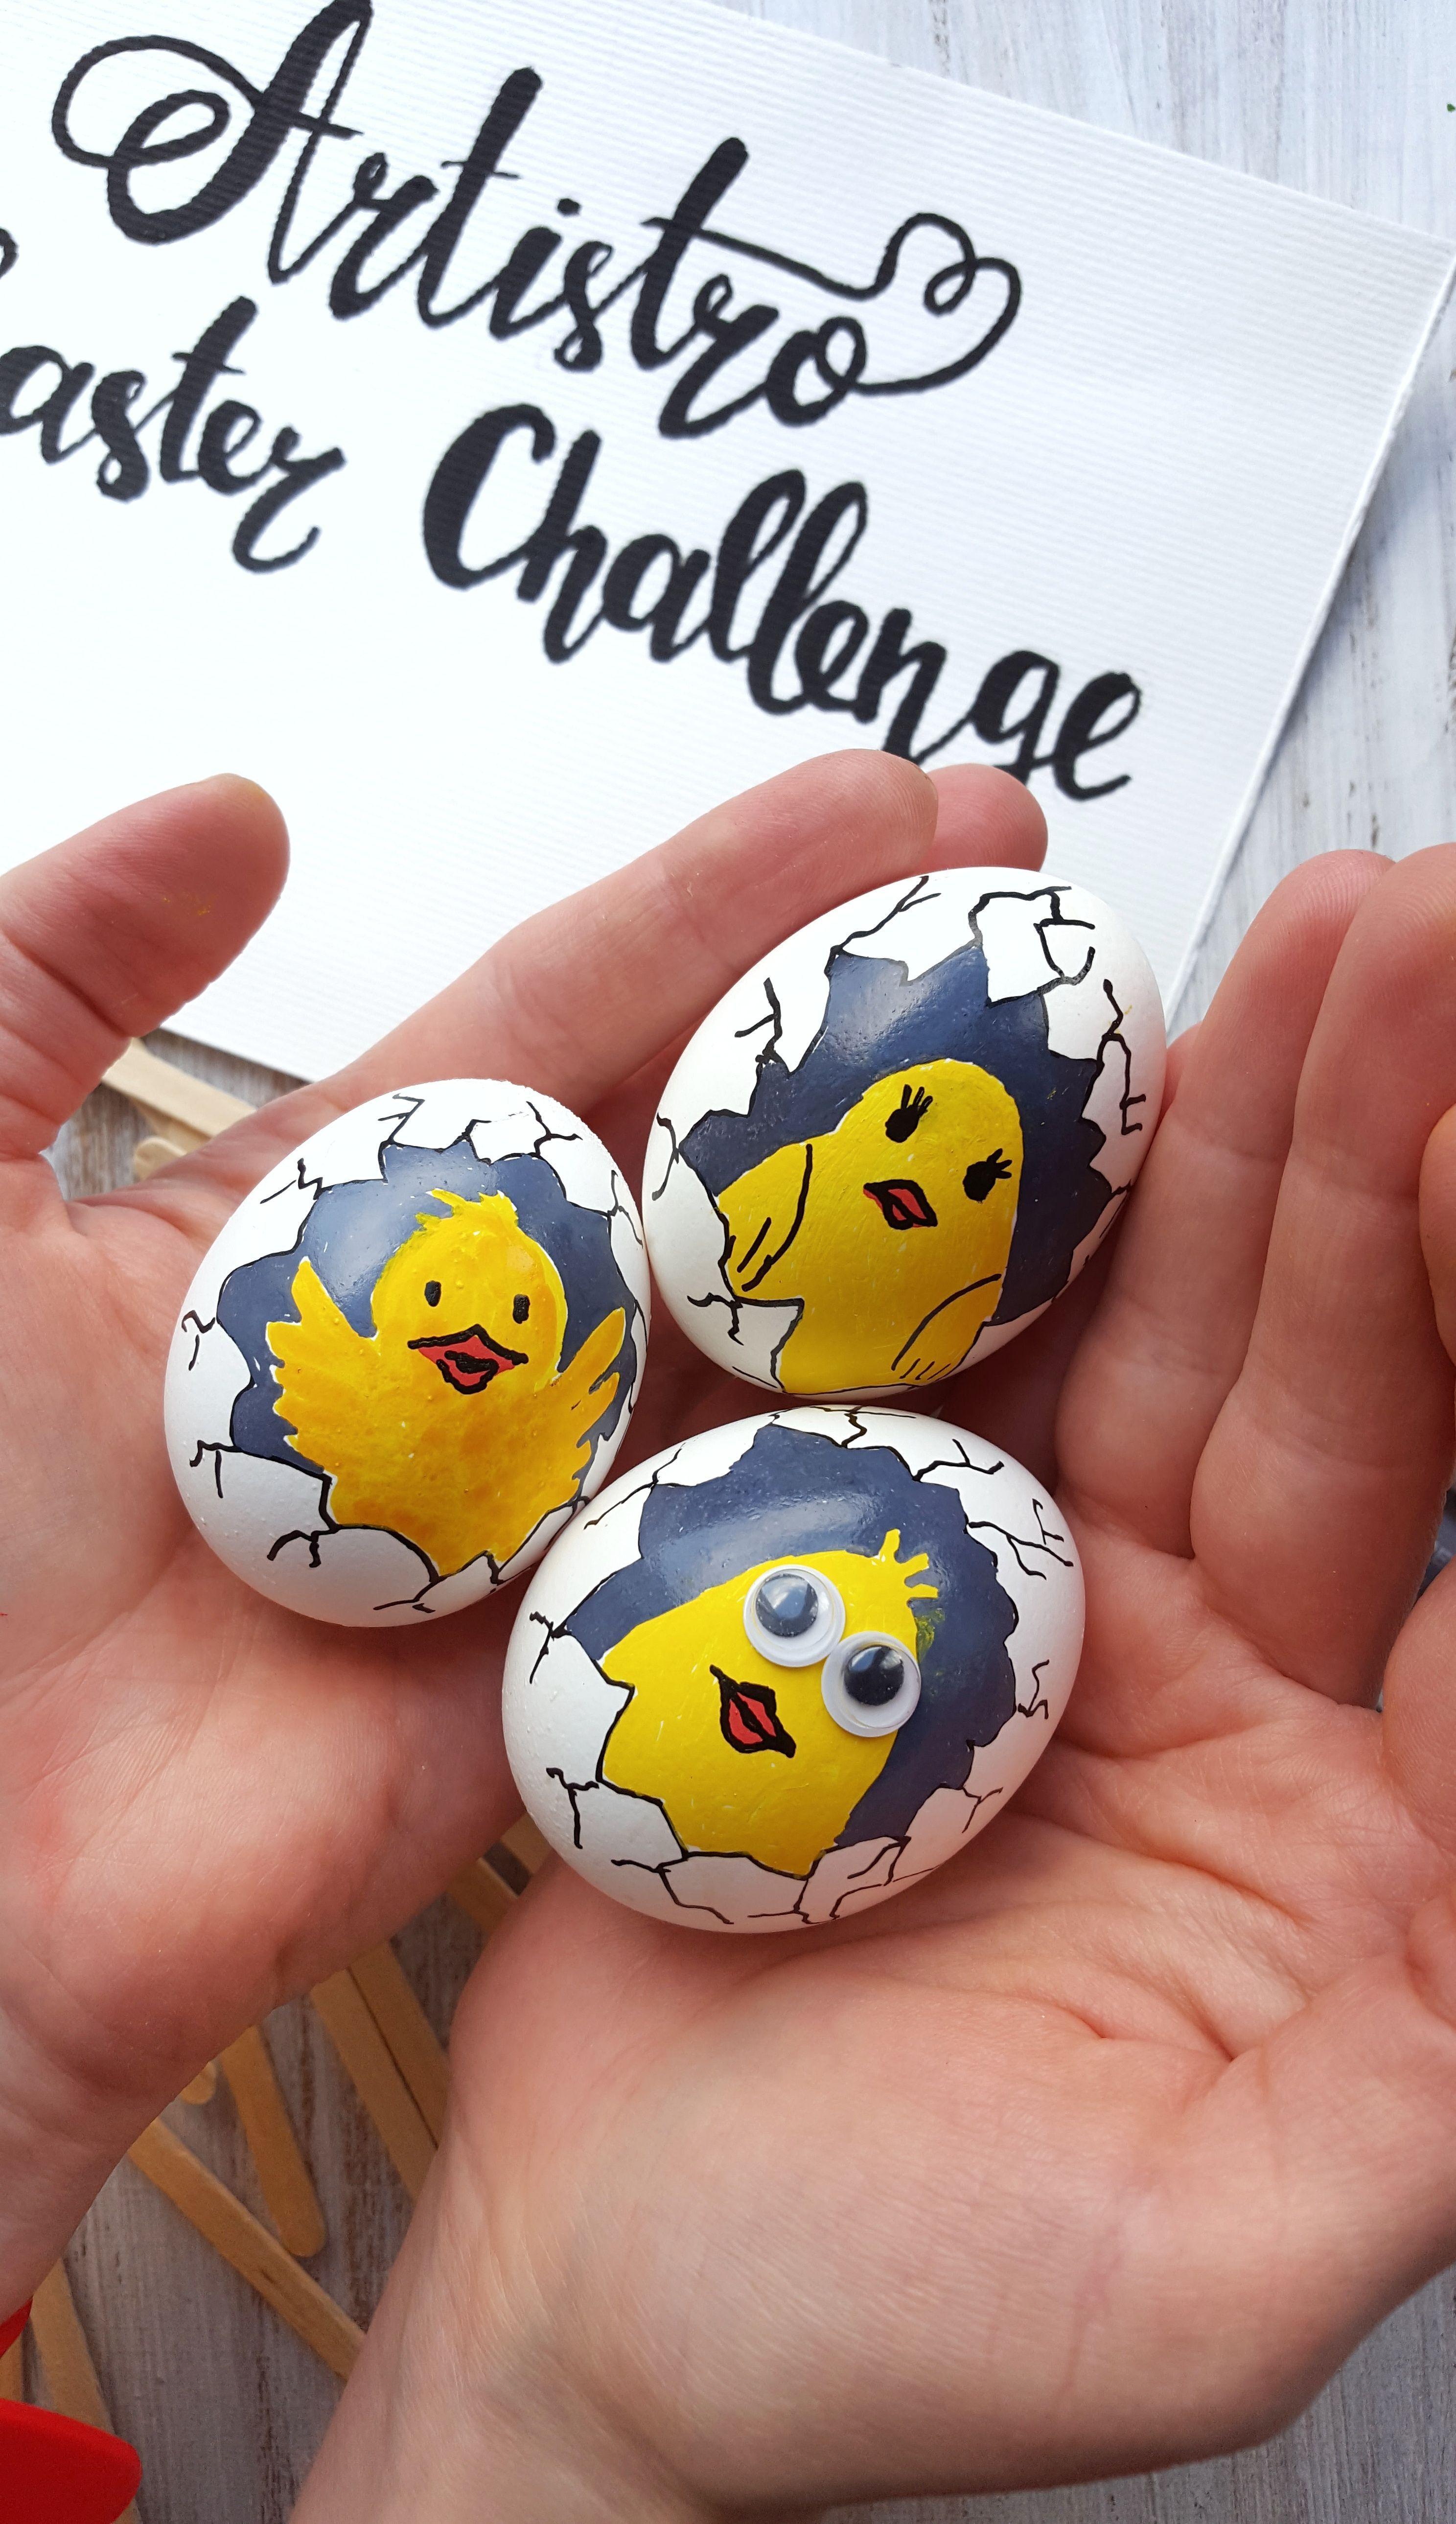 Small Easter keepsake wooden egg cute chick hand painted ornaments Easter basket filler egg hunt